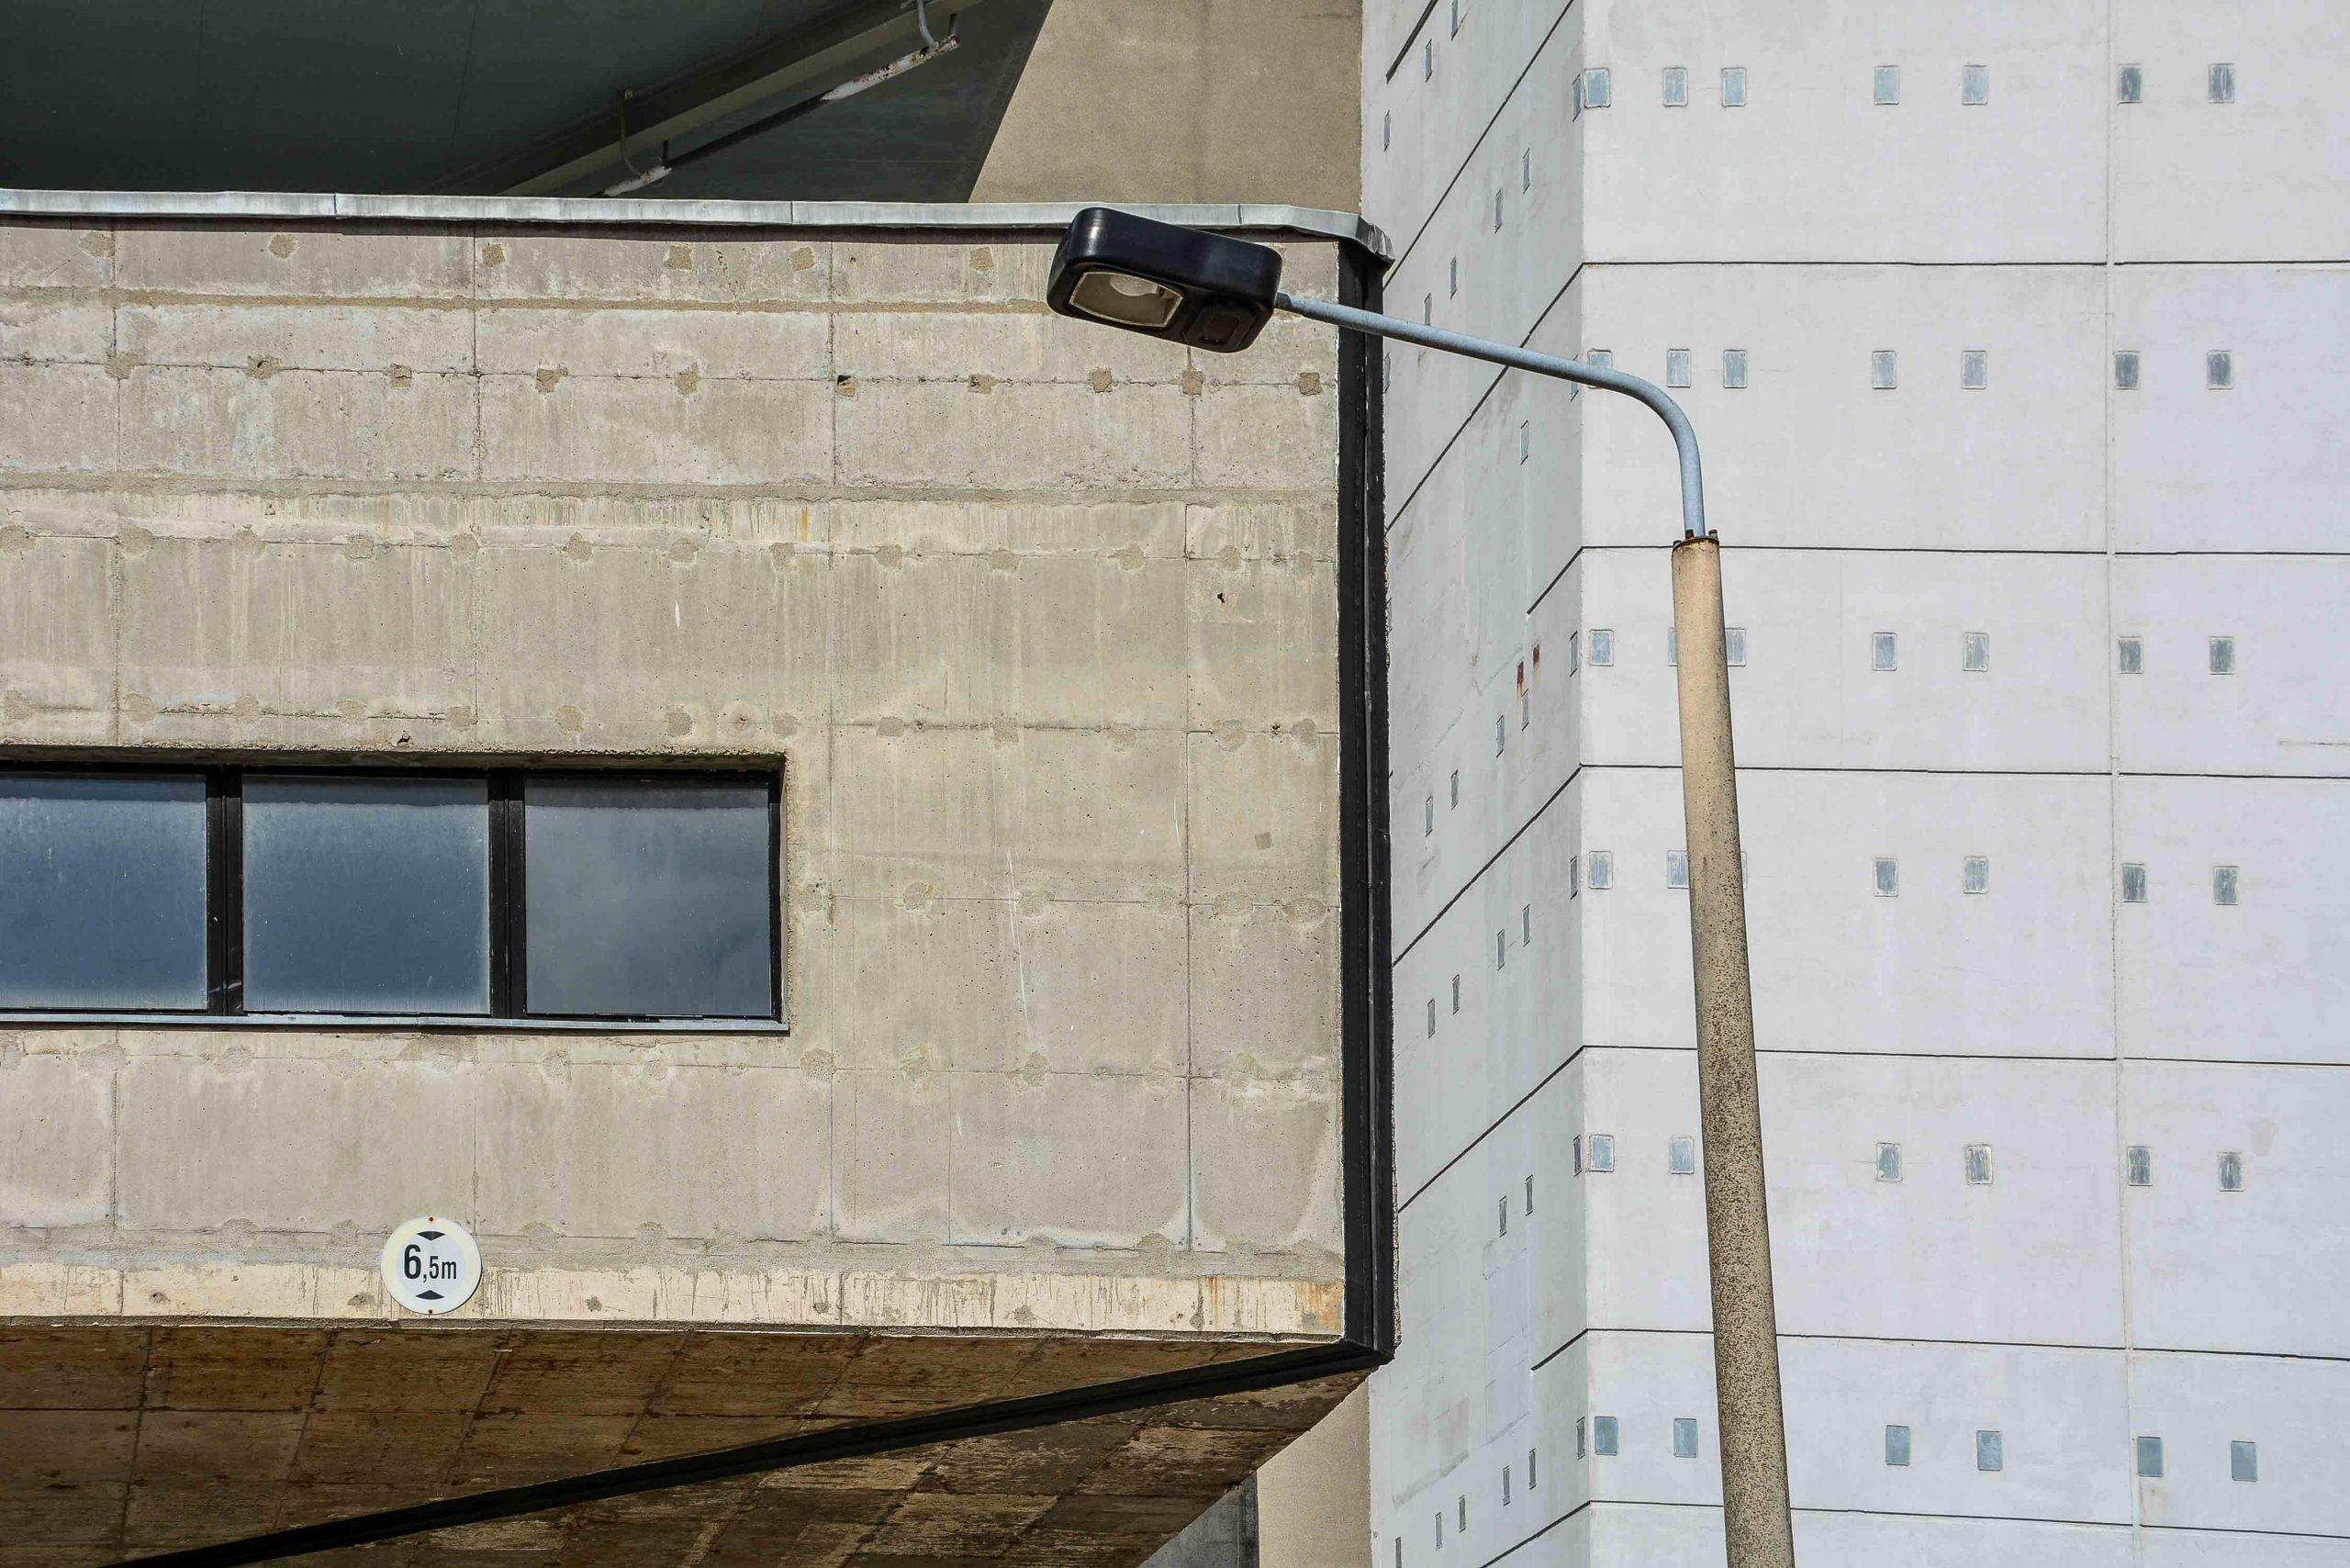 strassenlampe reaktor kernkraftwerk greifswald nuclear powerplant ost deutschland east germany gdr DDR mecklenburg vorpommern